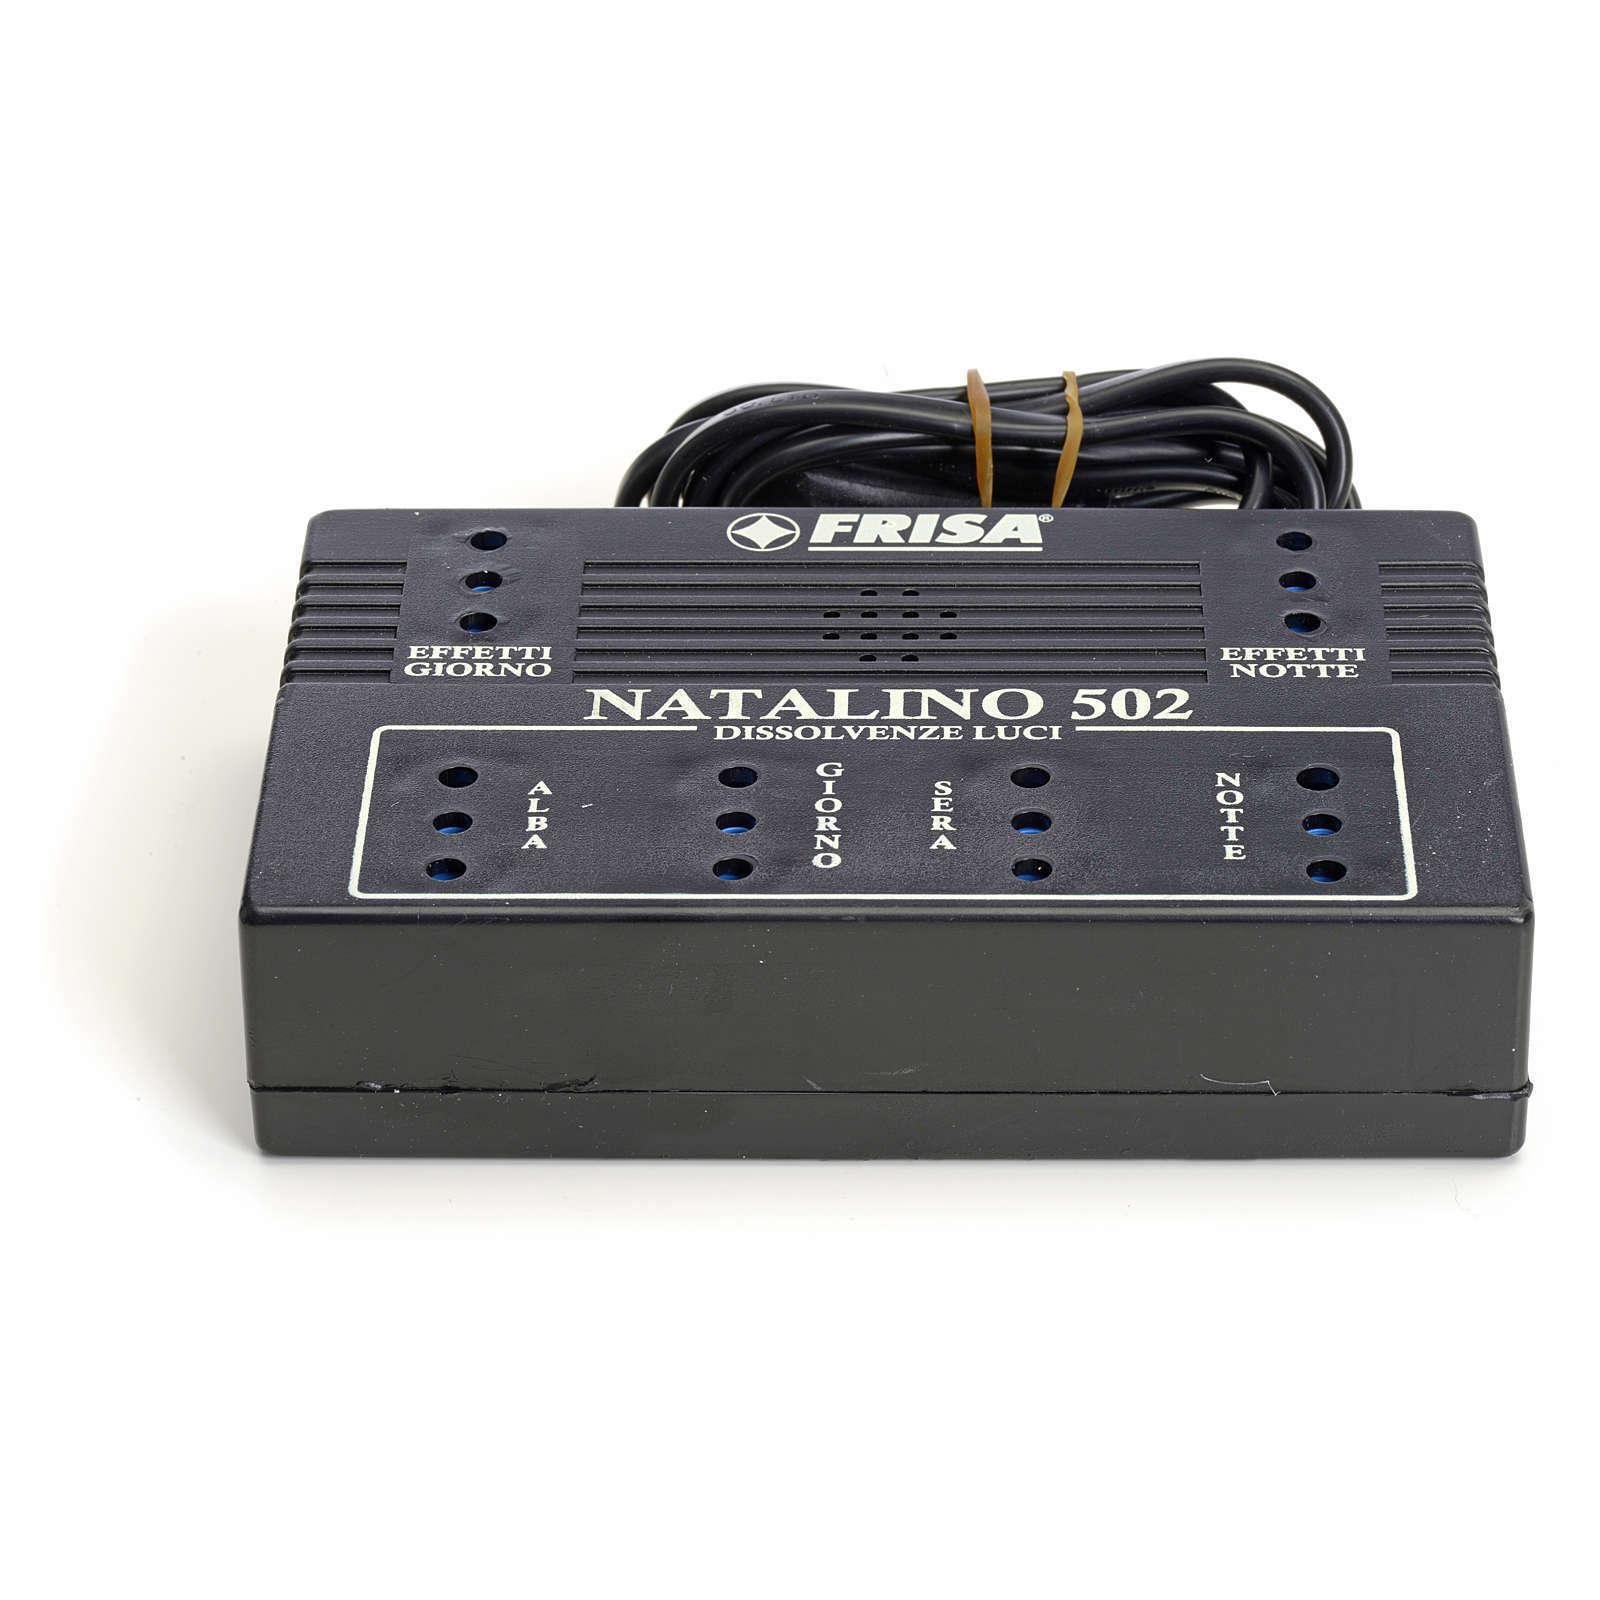 Natalino N502  centrale fondu jour et nuit